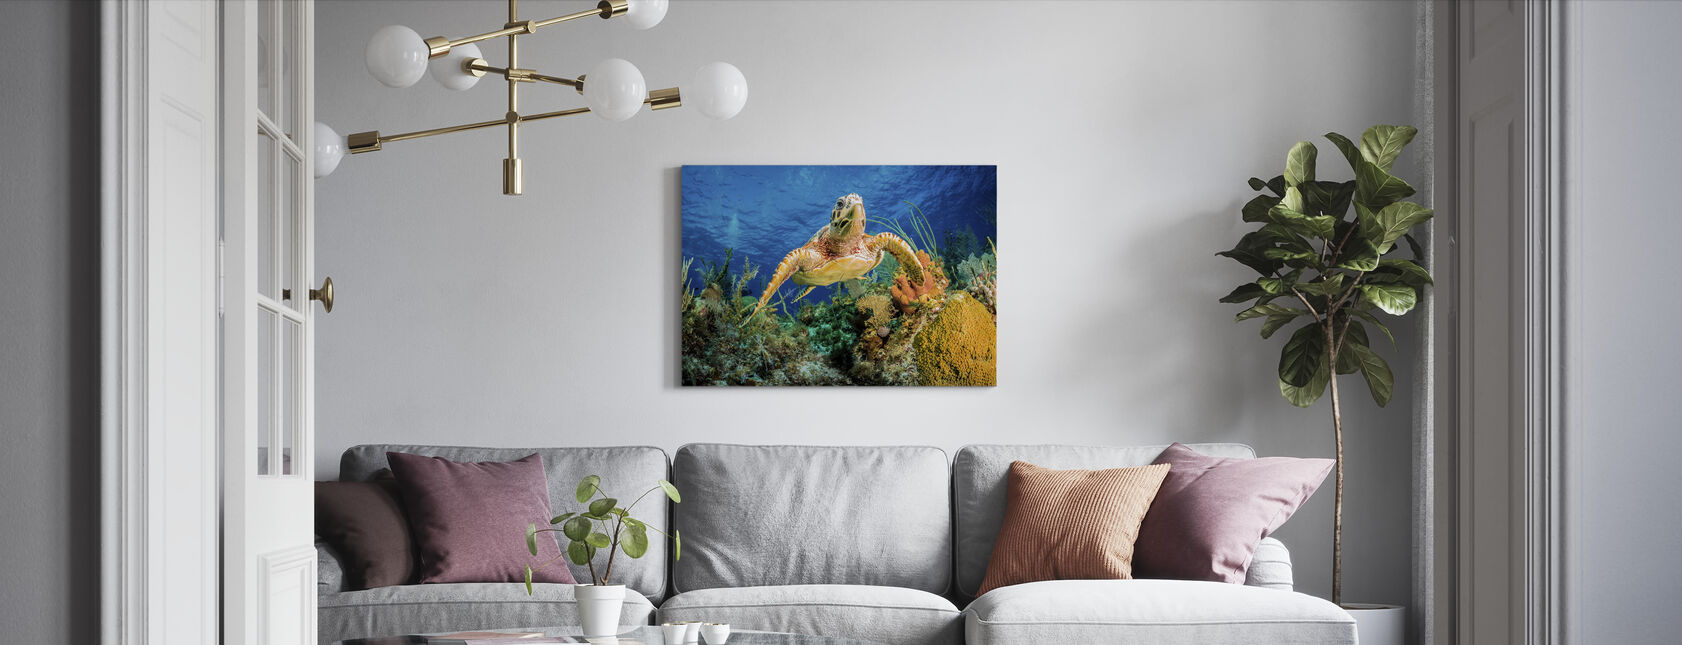 Hawksbill Turtle Svømming - Lerretsbilde - Stue